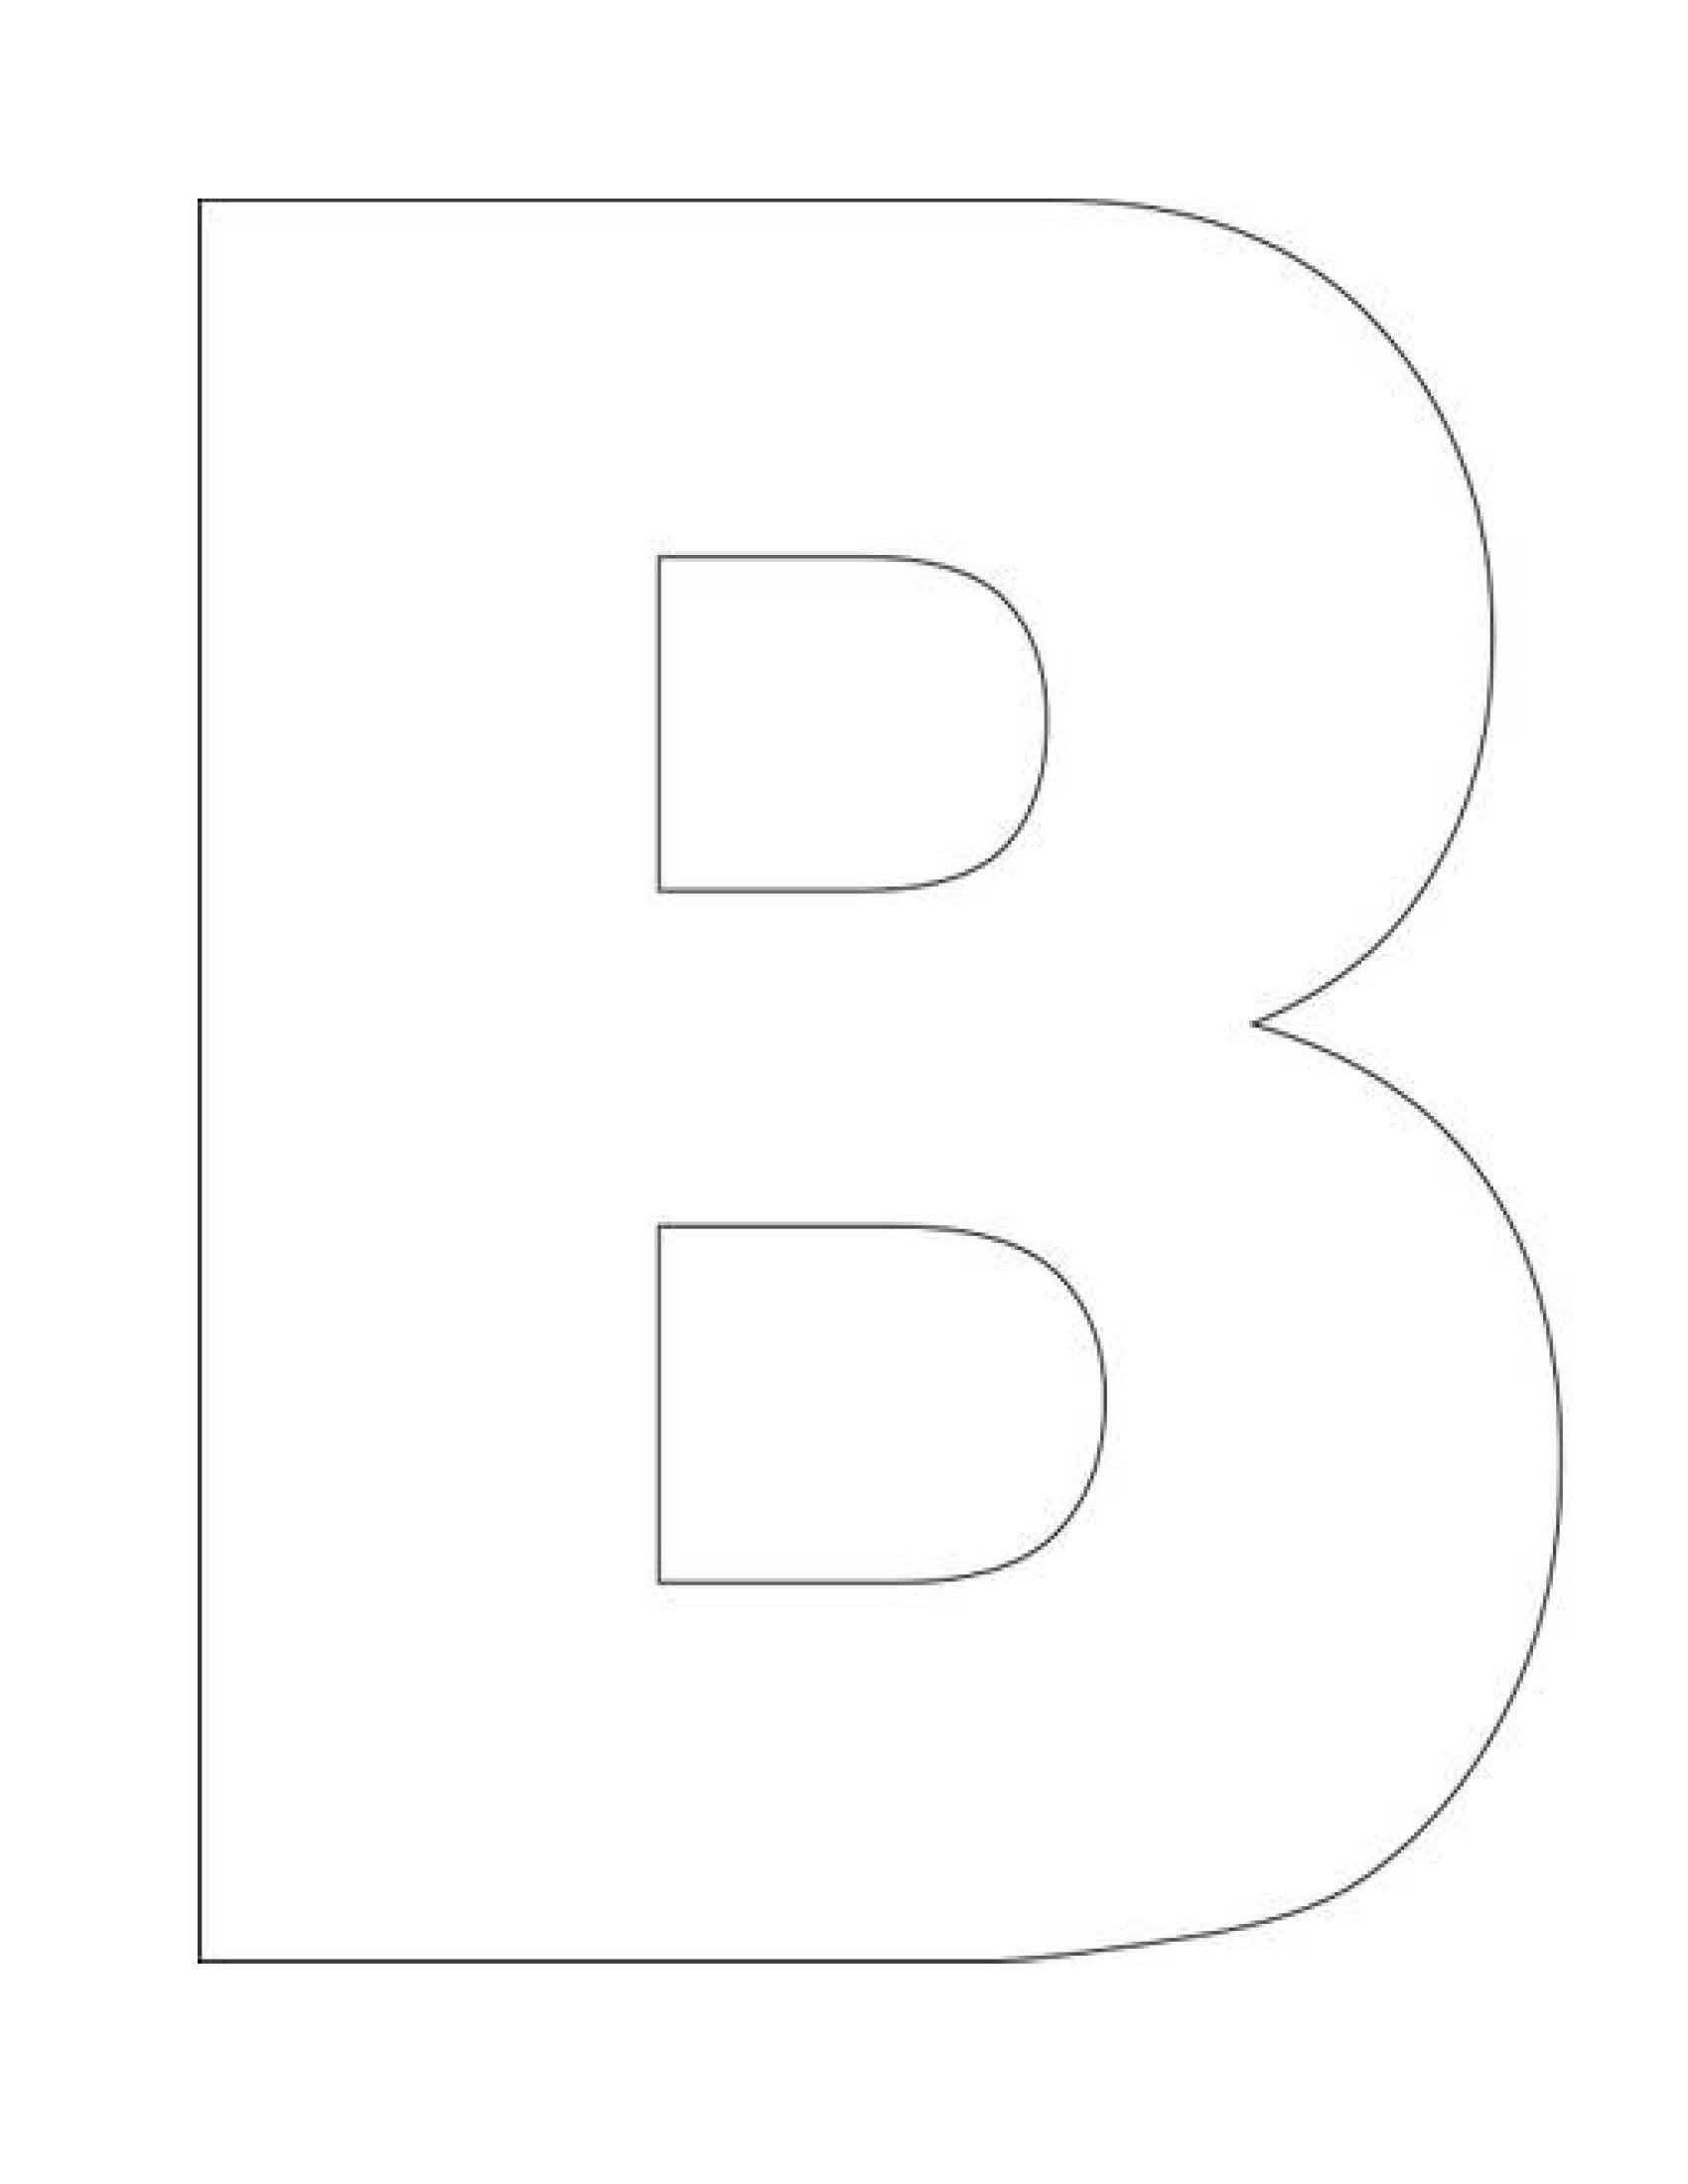 Alphabet Letter B Template Alphabet Printables Teaching The Alphabet Alphabet Coloring Pages